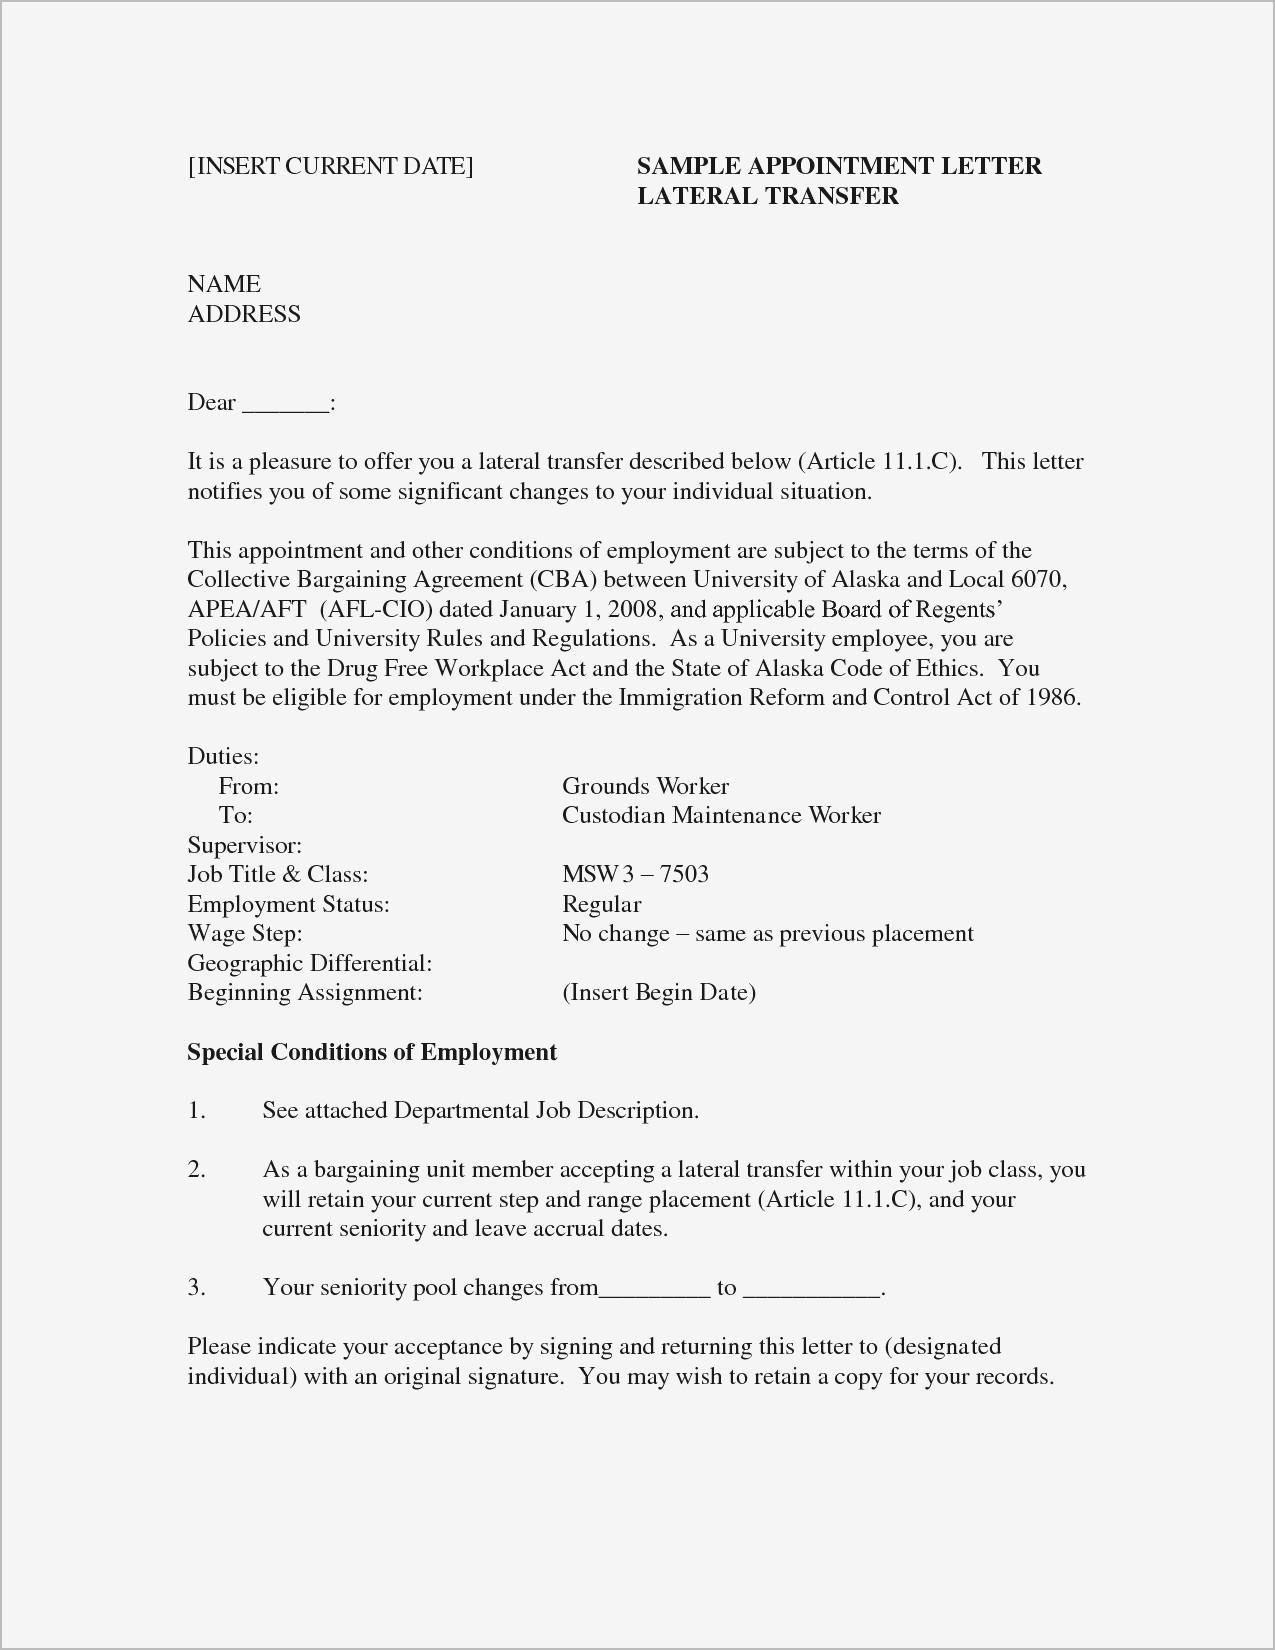 California Offer Letter Template - Job Fer Letter Template Us Copy Od Consultant Cover Letter Fungram